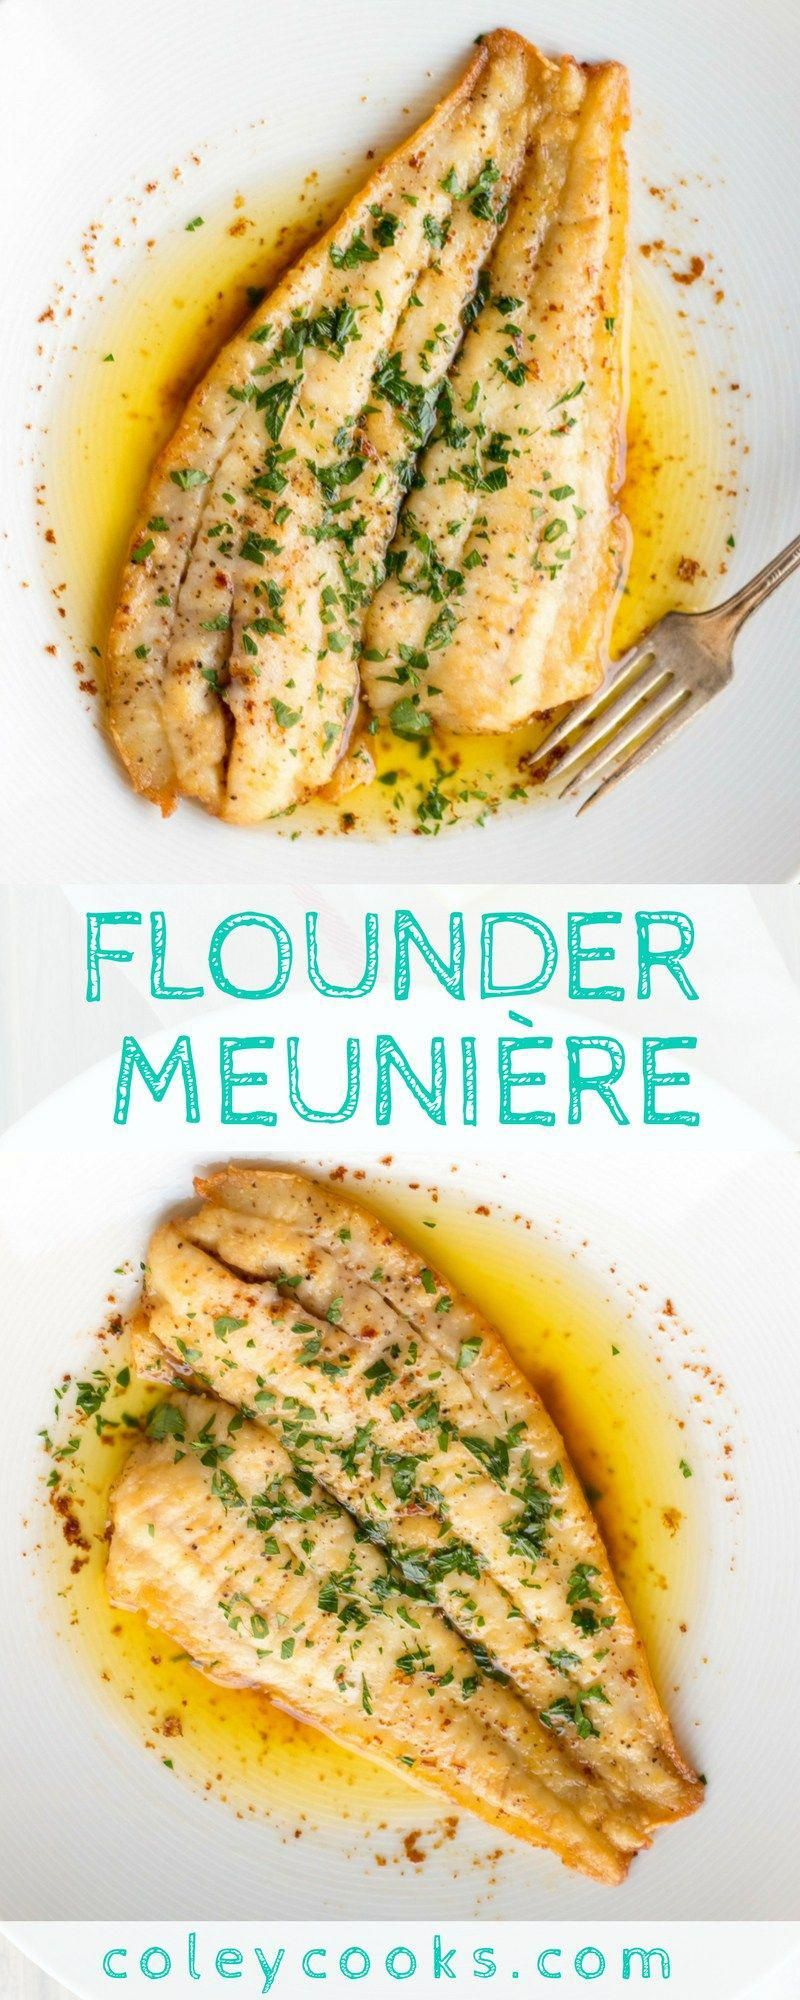 Photo of Flounder Meunière (Video!) | Coley Cooks…